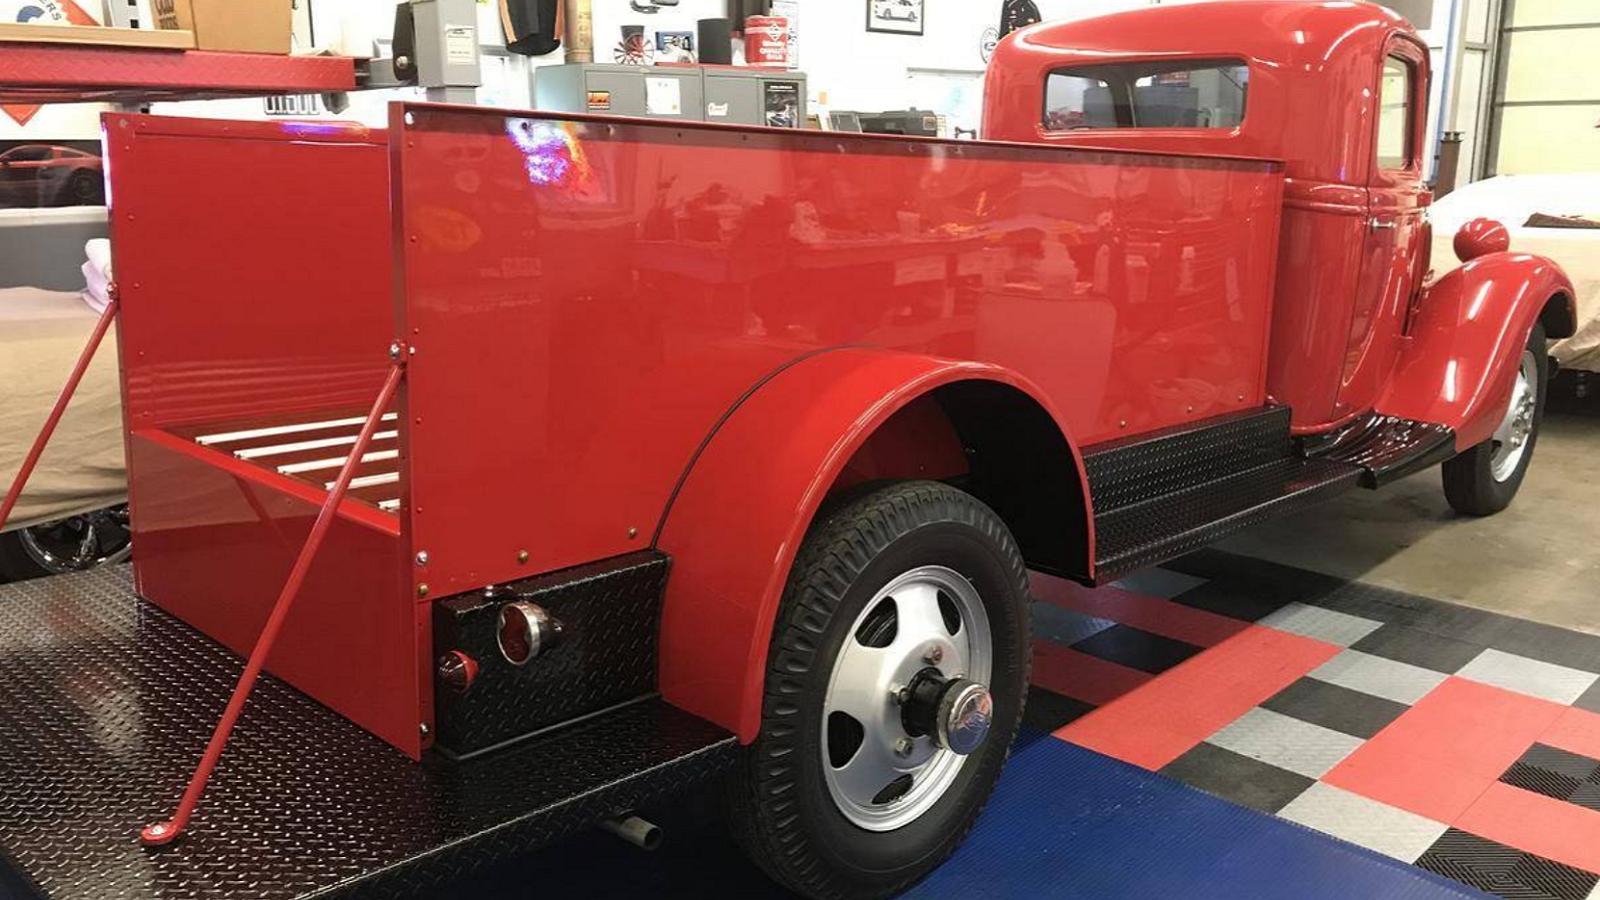 Vintage 1935 Ford Pumper Truck Gets New Lease on Life